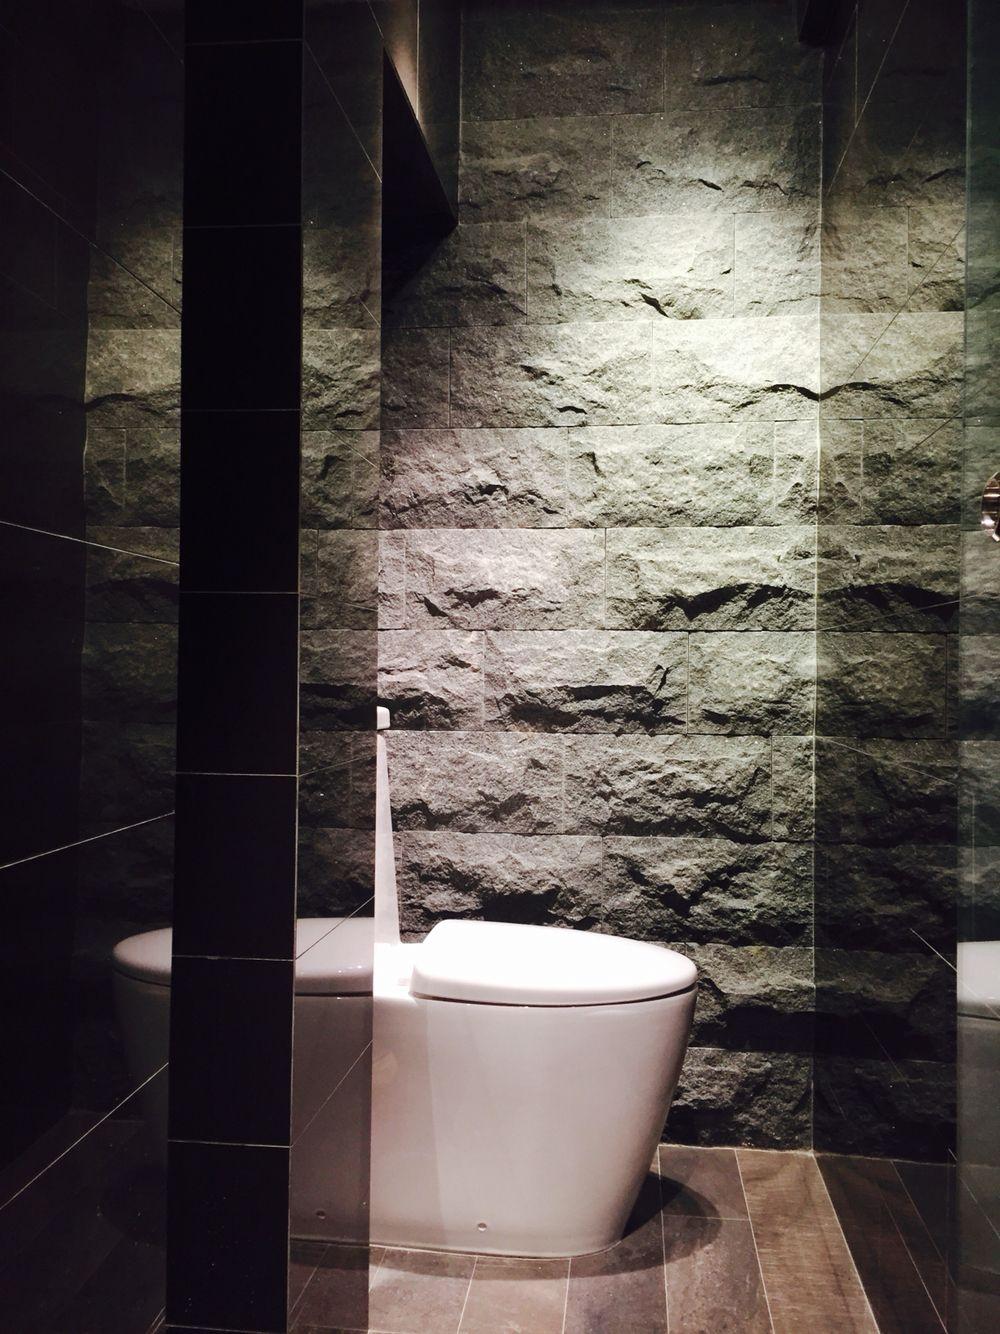 Sexy toilet   Chino chic studio in 2019   Toilet, Bathroom, Spa